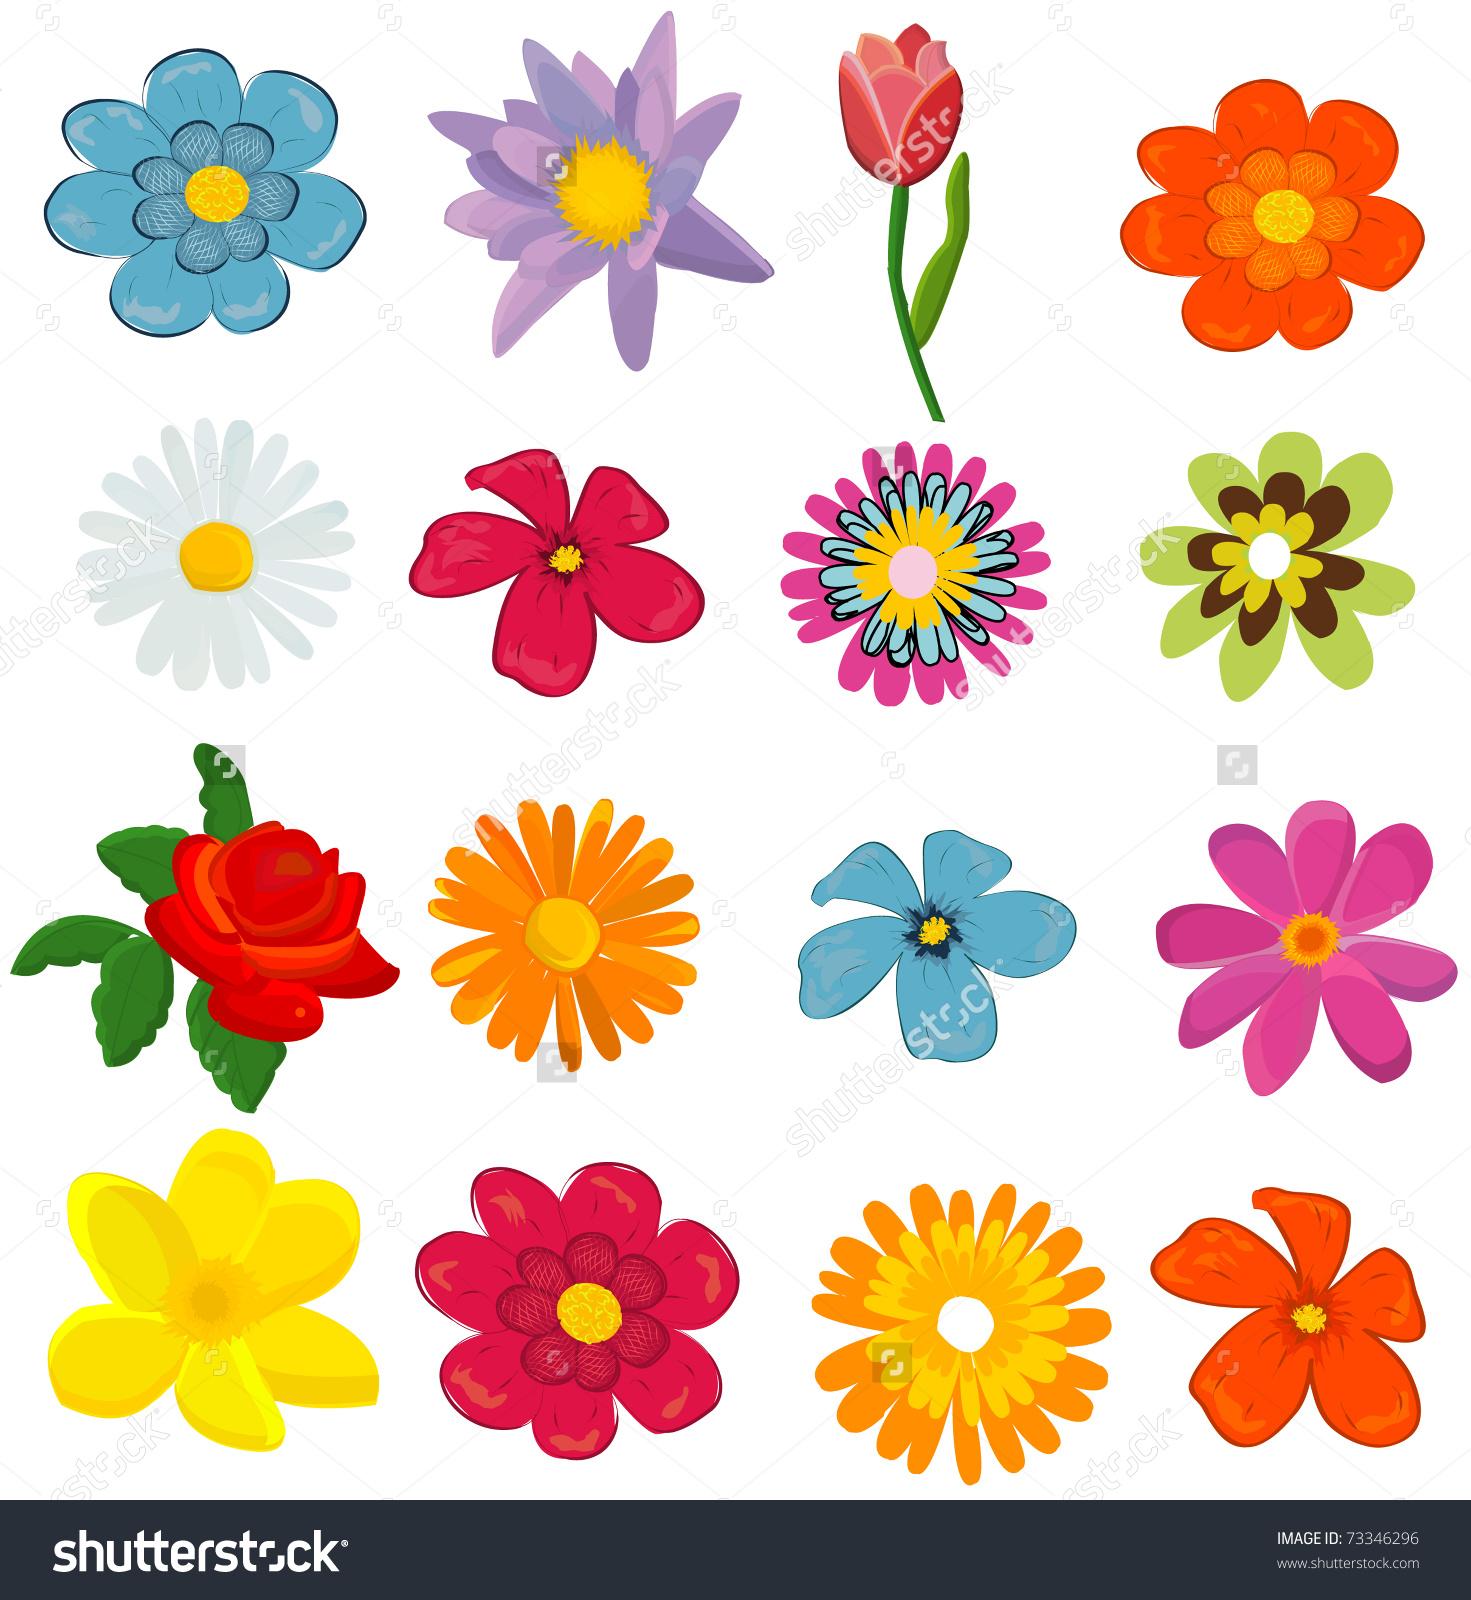 Graphics flower clipart free Set Flower Graphics Vector Stock Vector 73346296 - Shutterstock clipart free